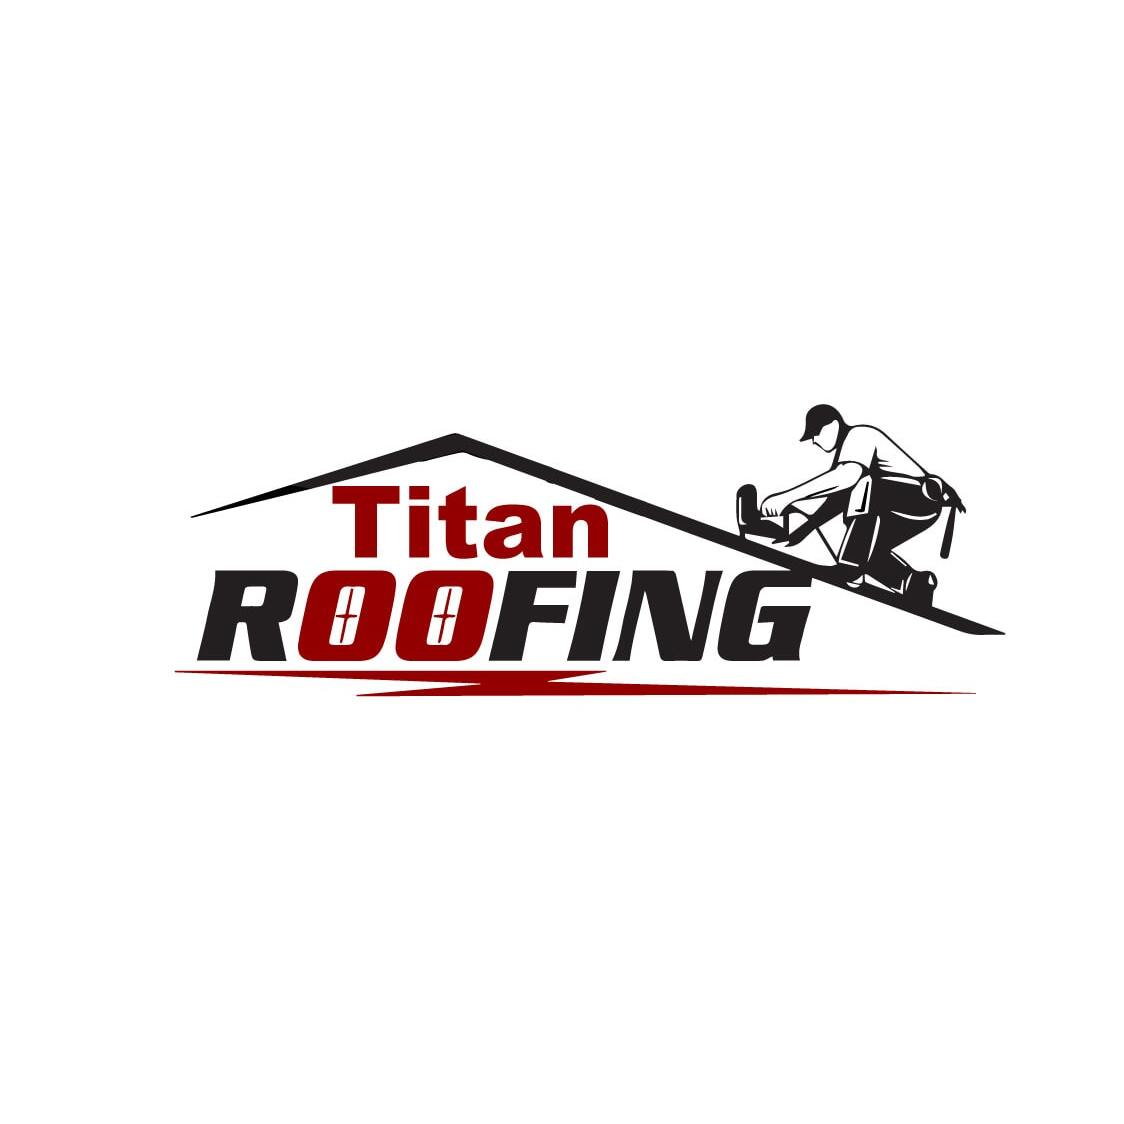 Titan Roofing